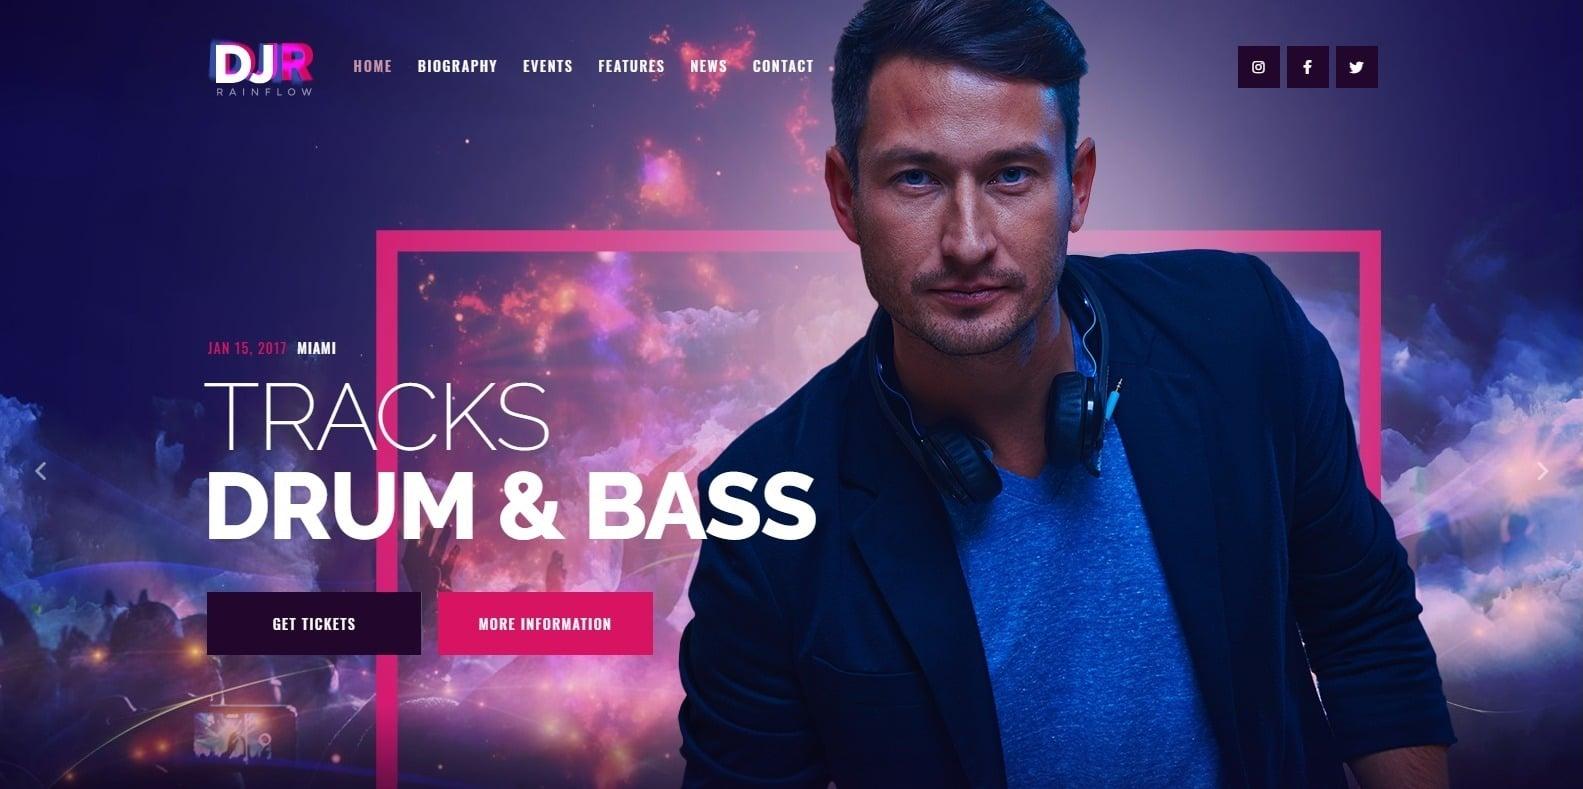 DJR-dj-website-template